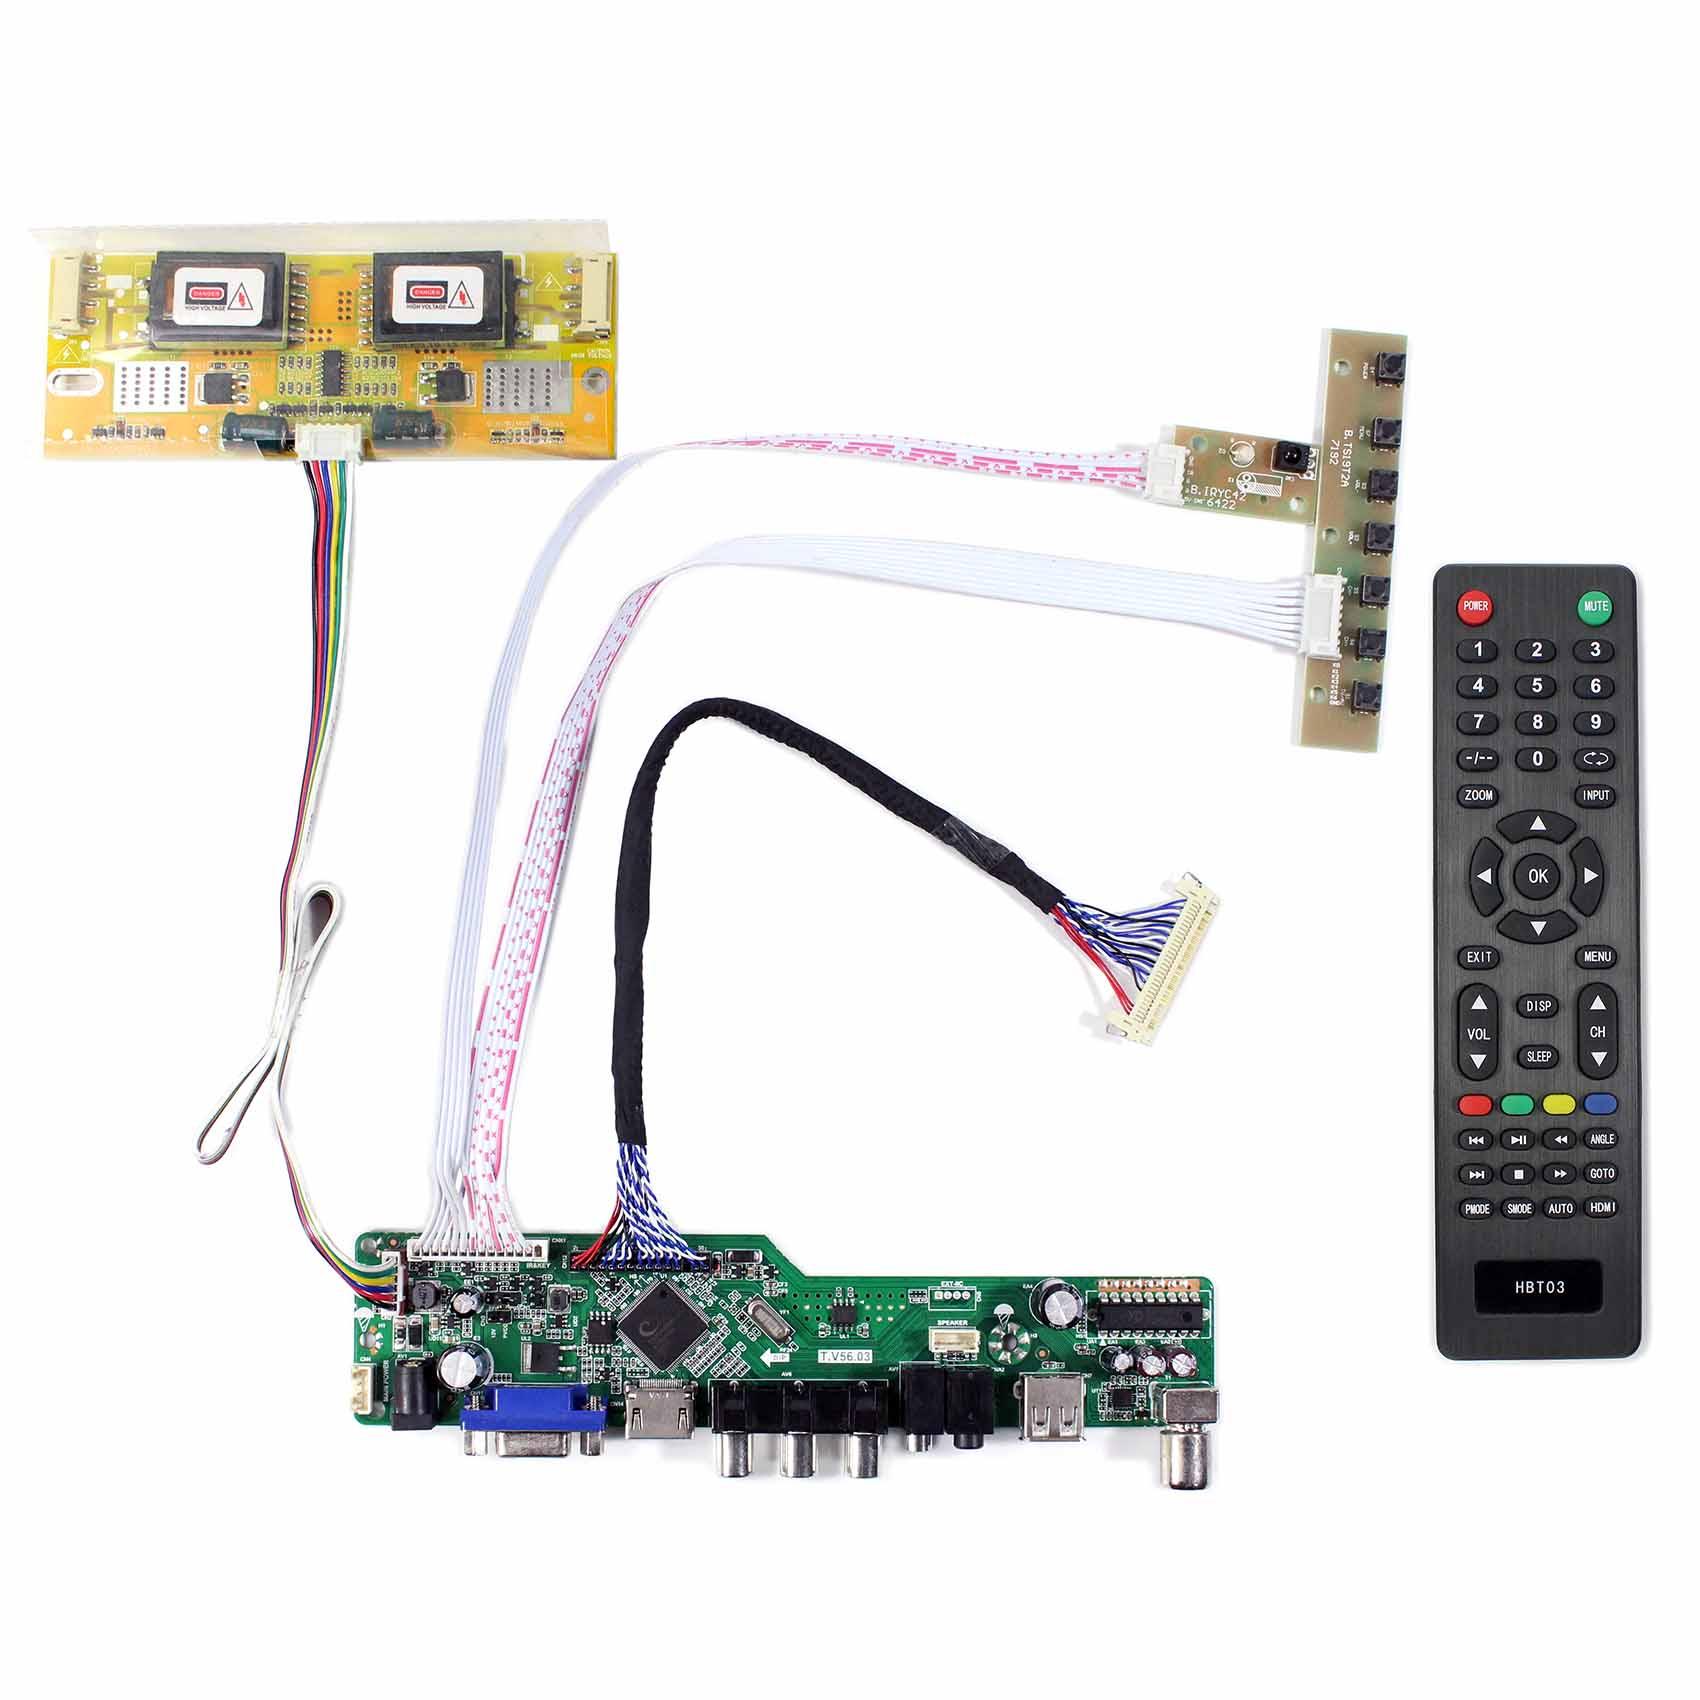 T.V56.03 for 17inch LCD Screen HD MI VGA AV USB RF LCD Controller Board USB Support Video M170EN06 M170EN05